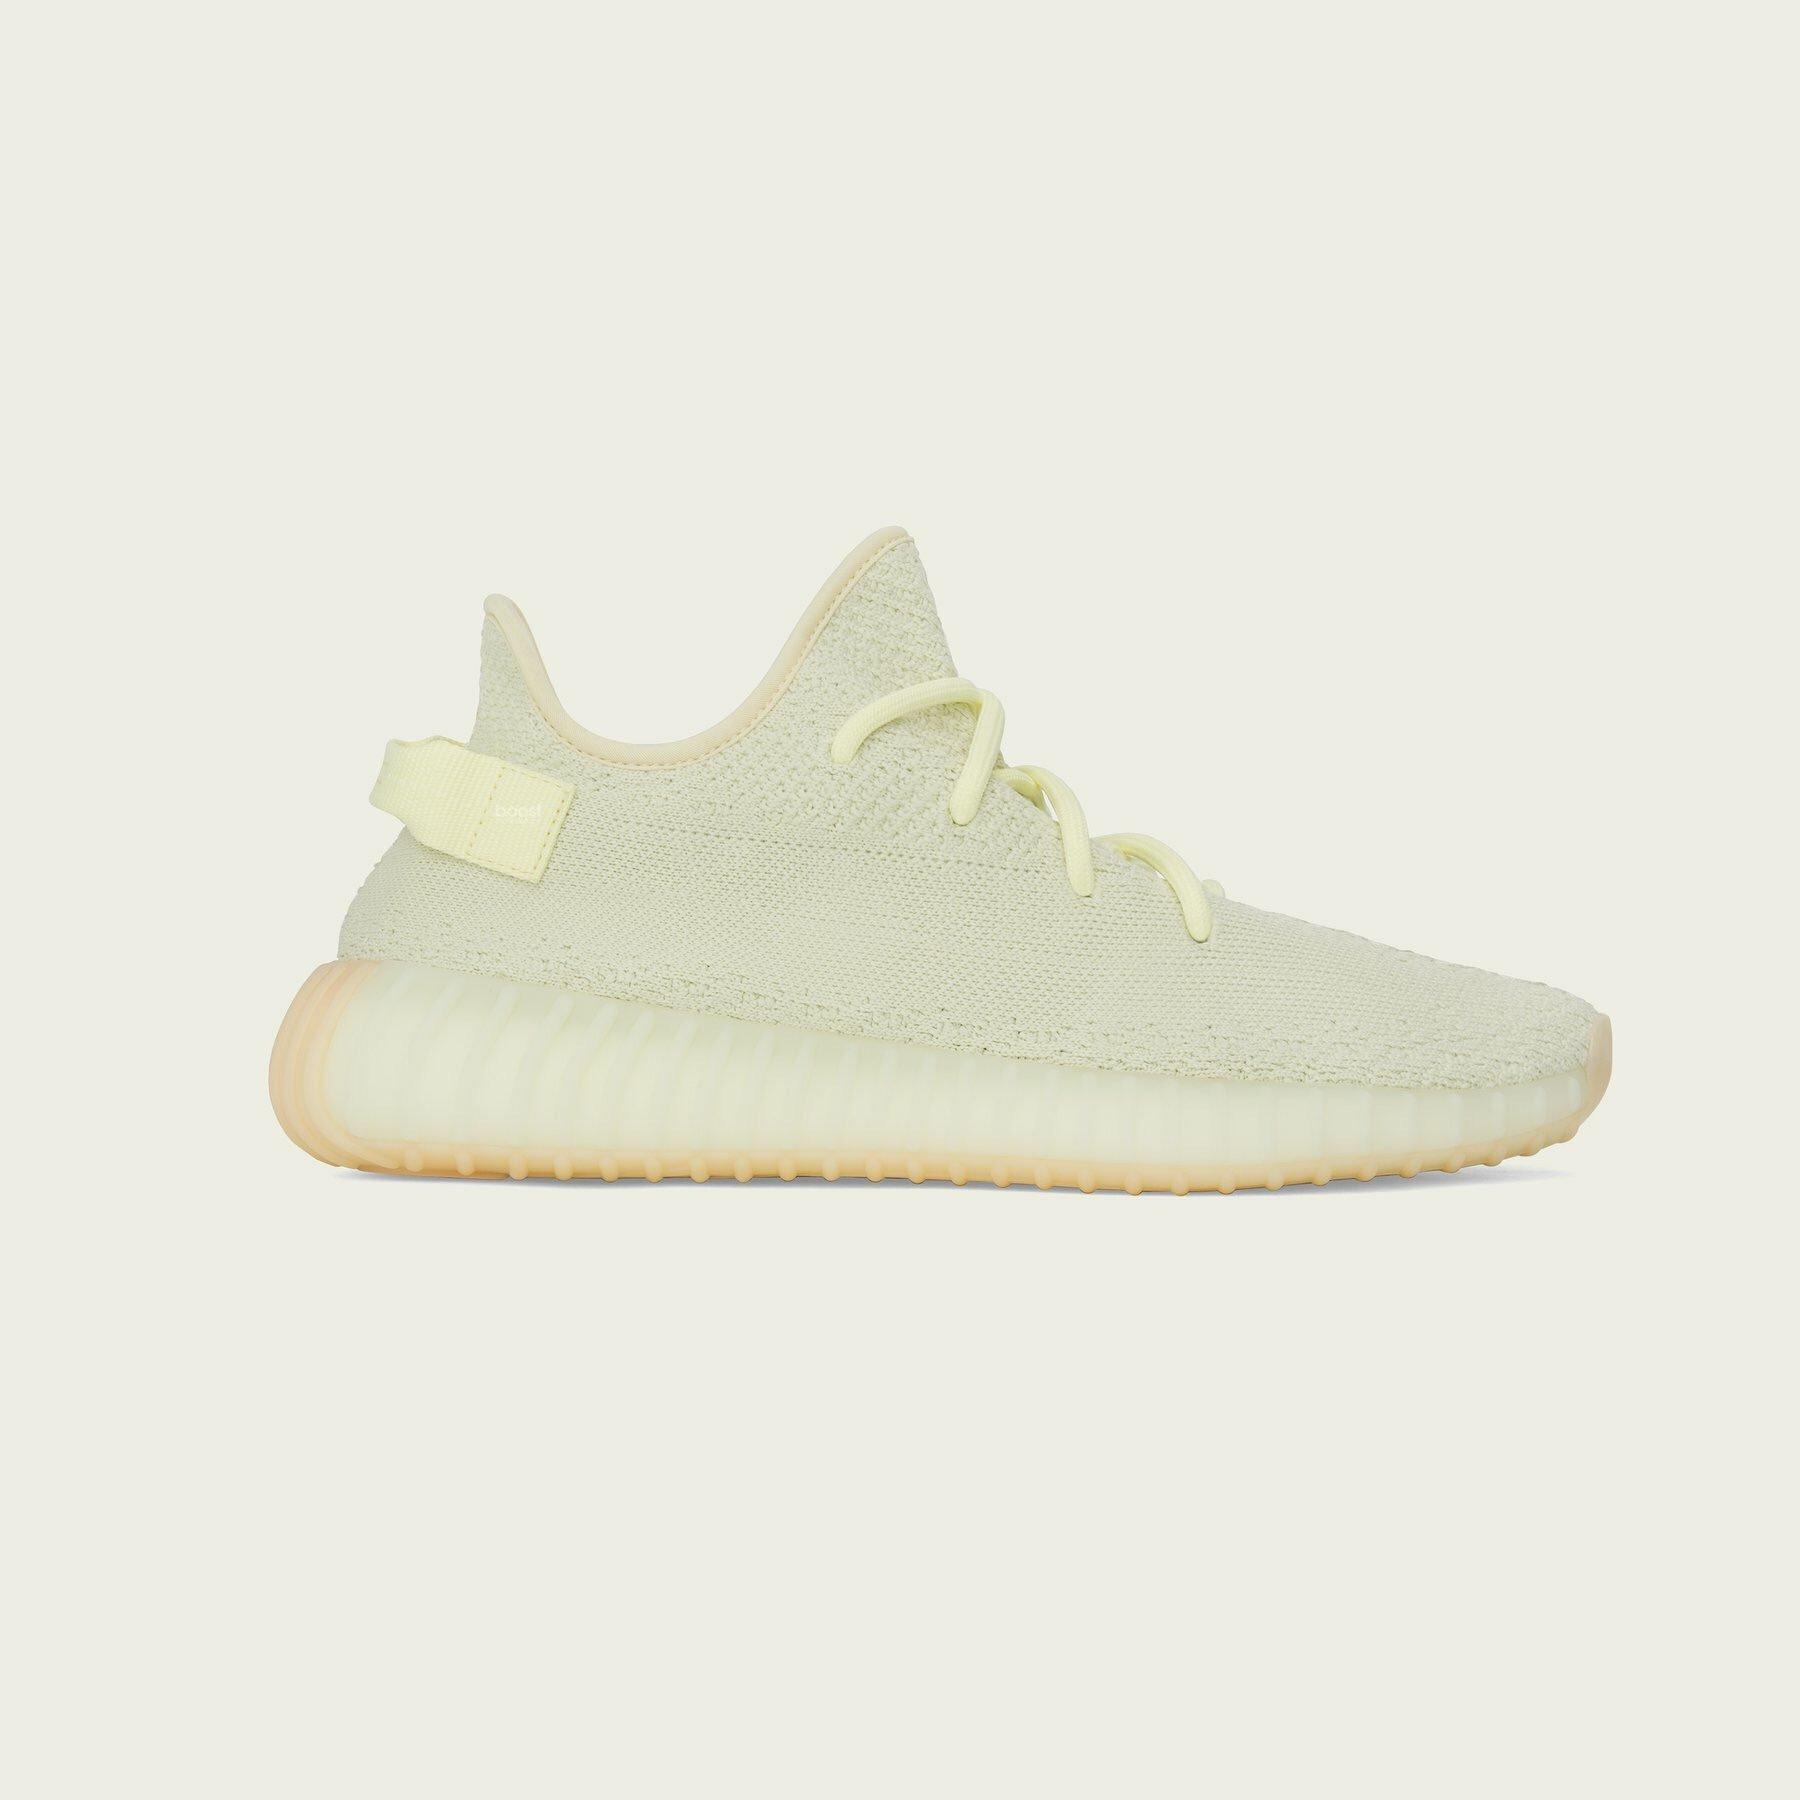 adidas Yeezy Boost V2 Butter 3